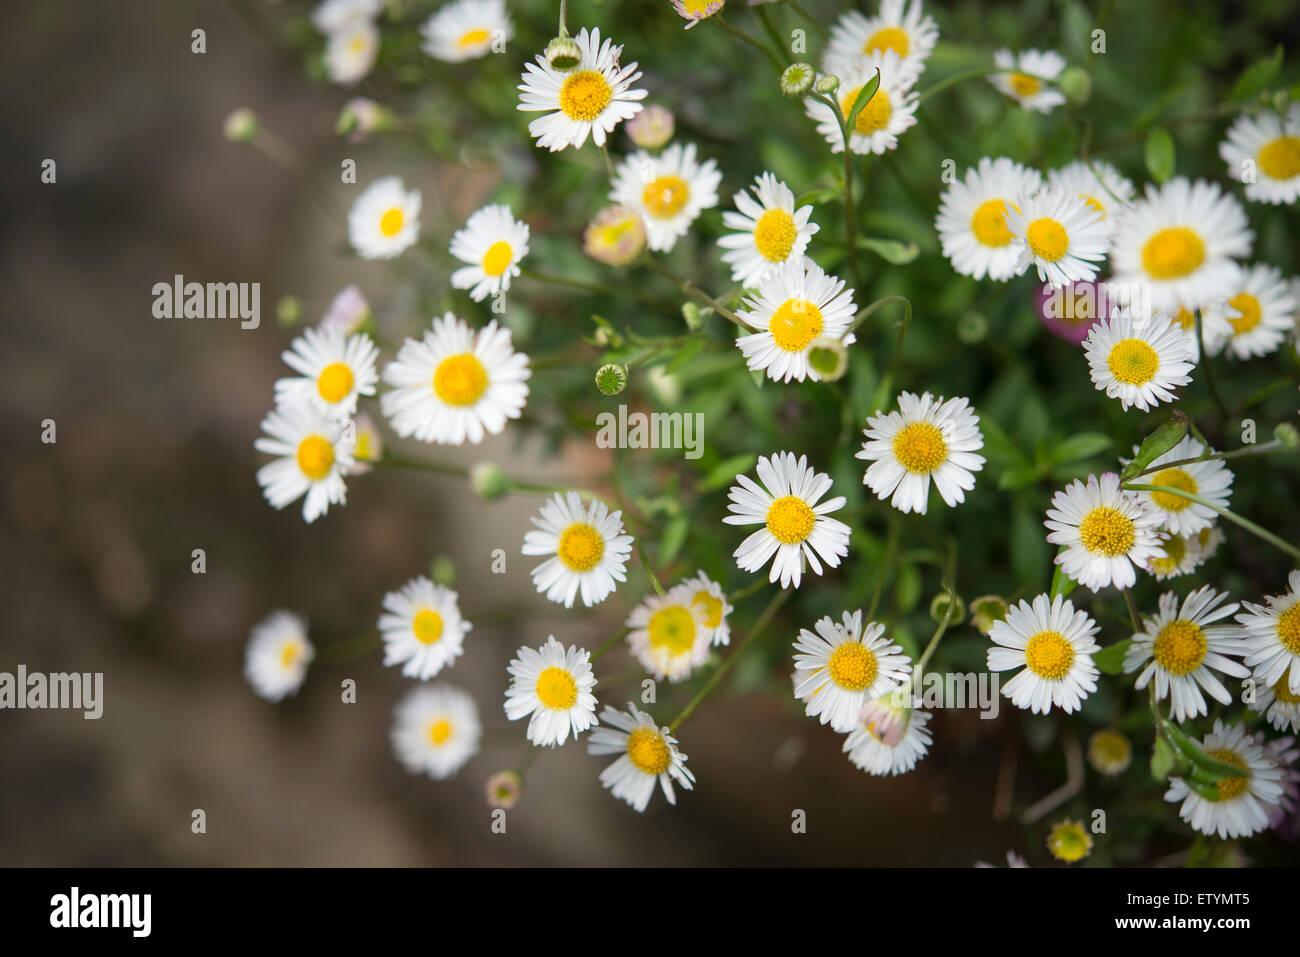 Daisy Like Flowers Of Fleabane Stock Photos Daisy Like Flowers Of